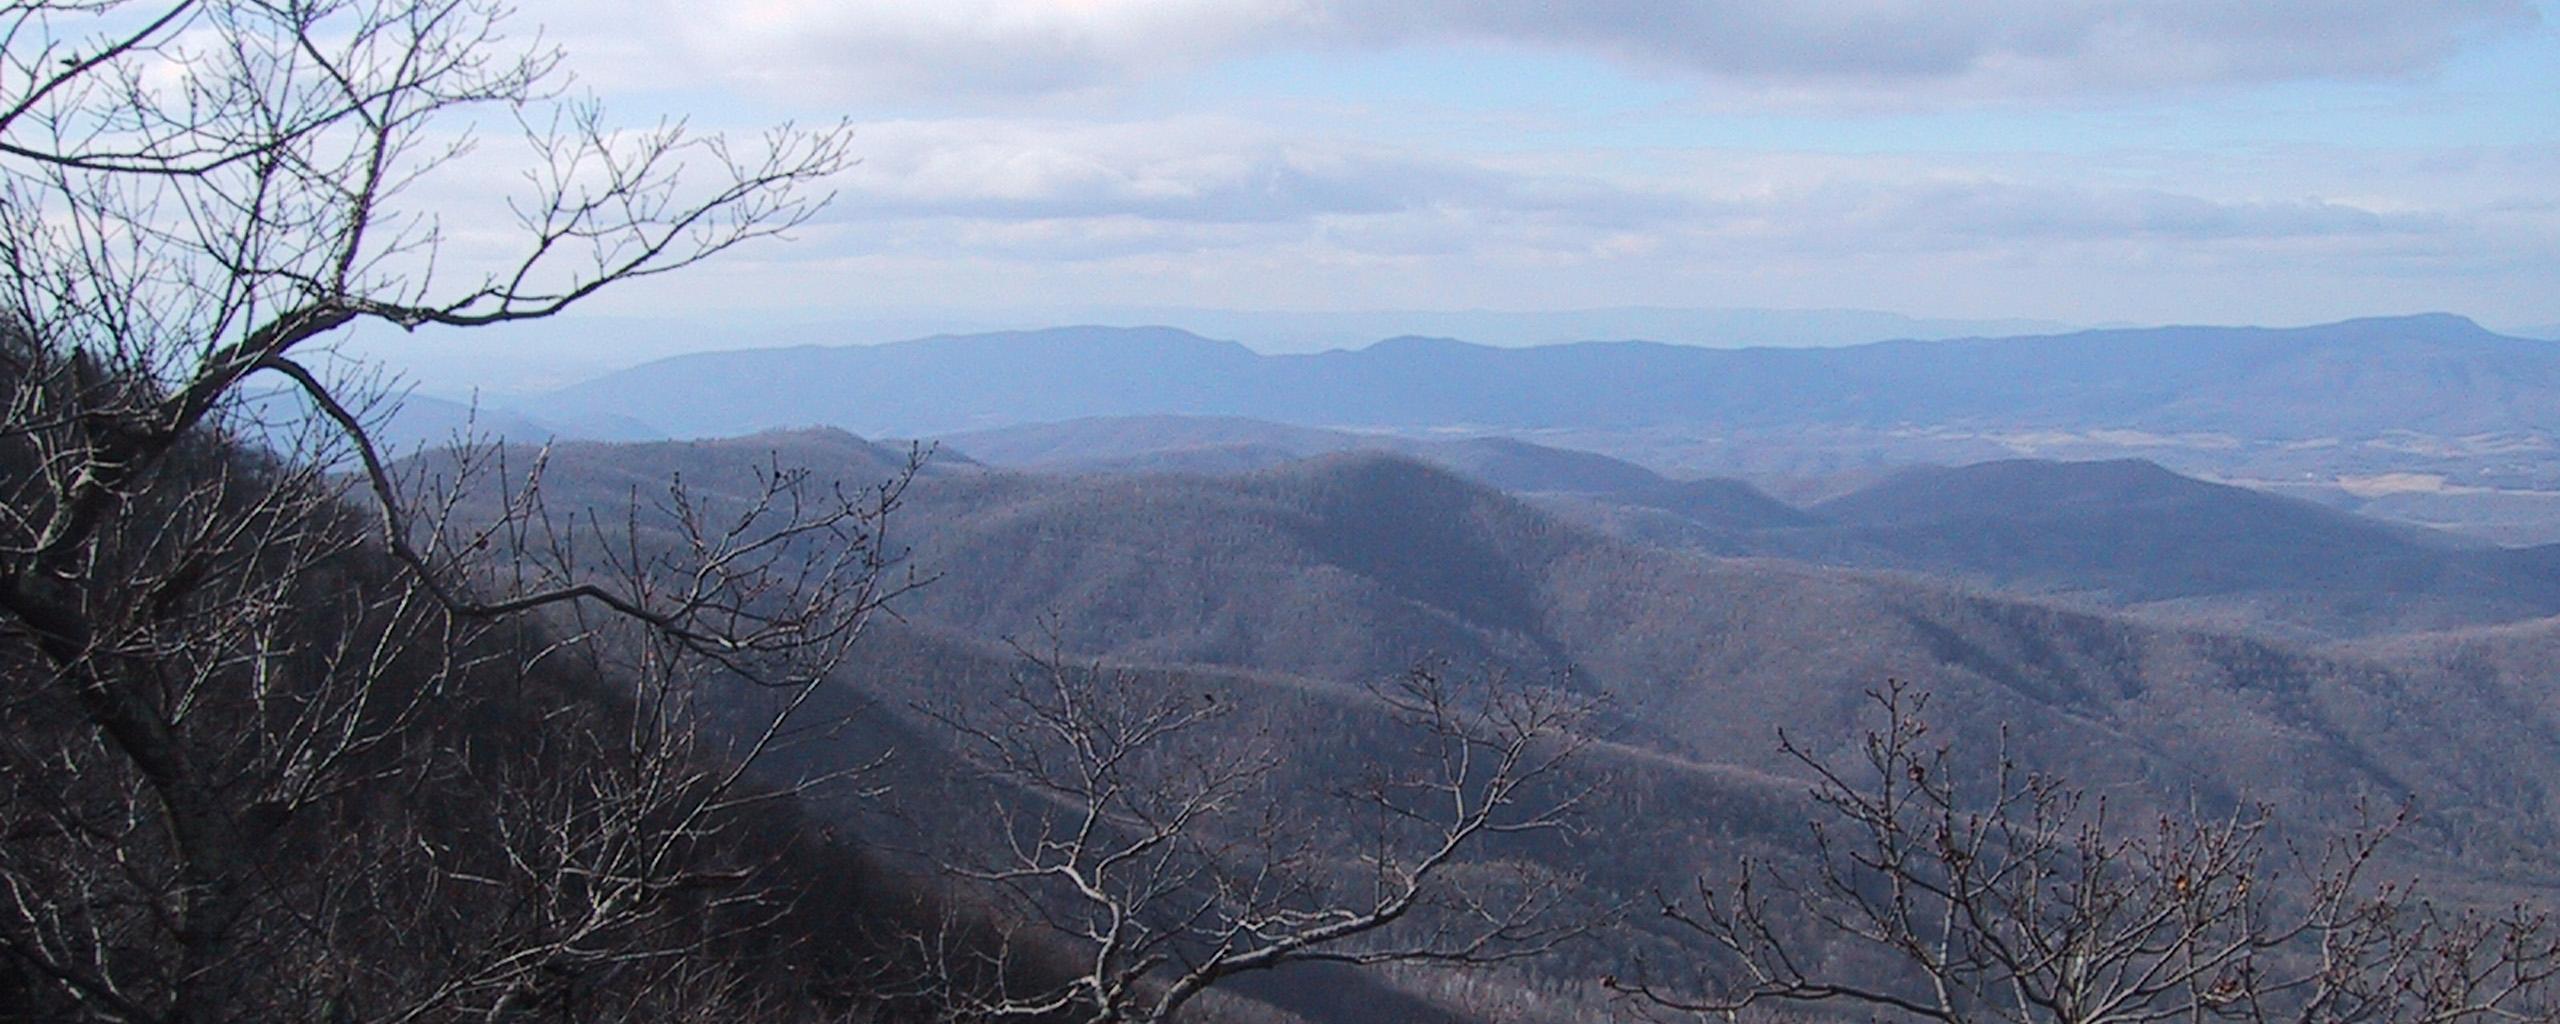 appalachian blue ridge mountains wallpaper - photo #18